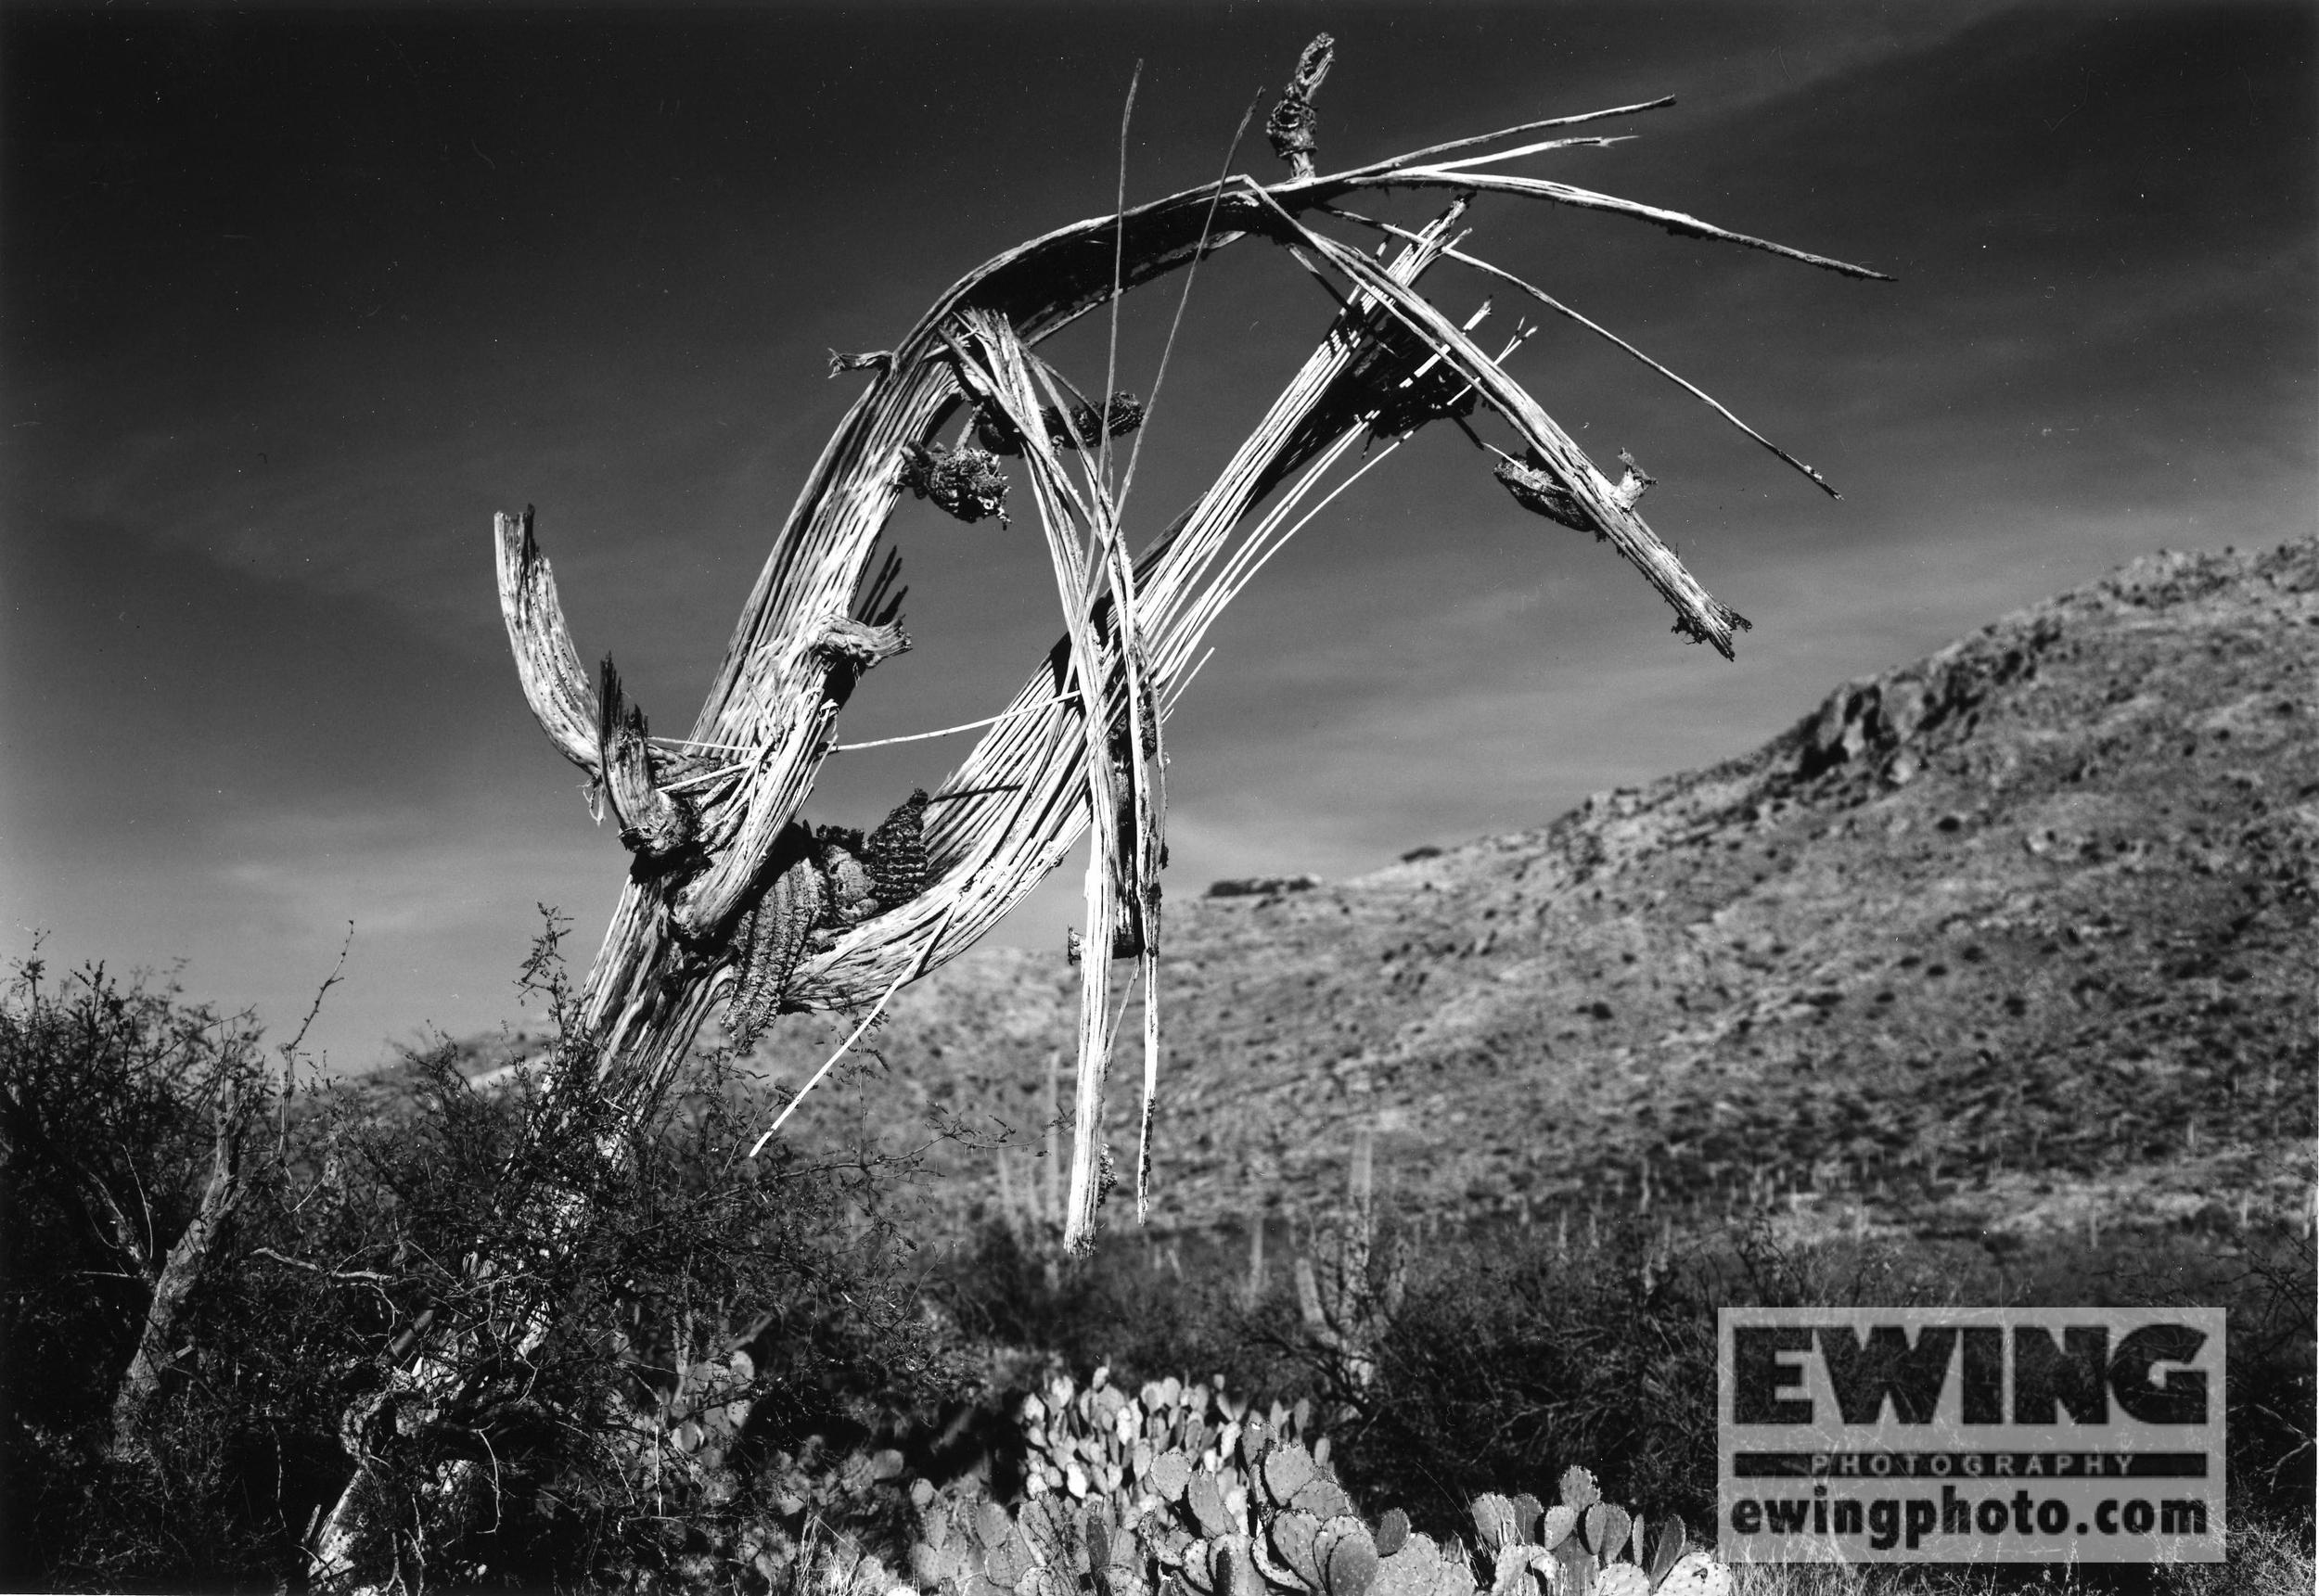 Dead Saguaro Cactus Saguaro National Park East, Airzona